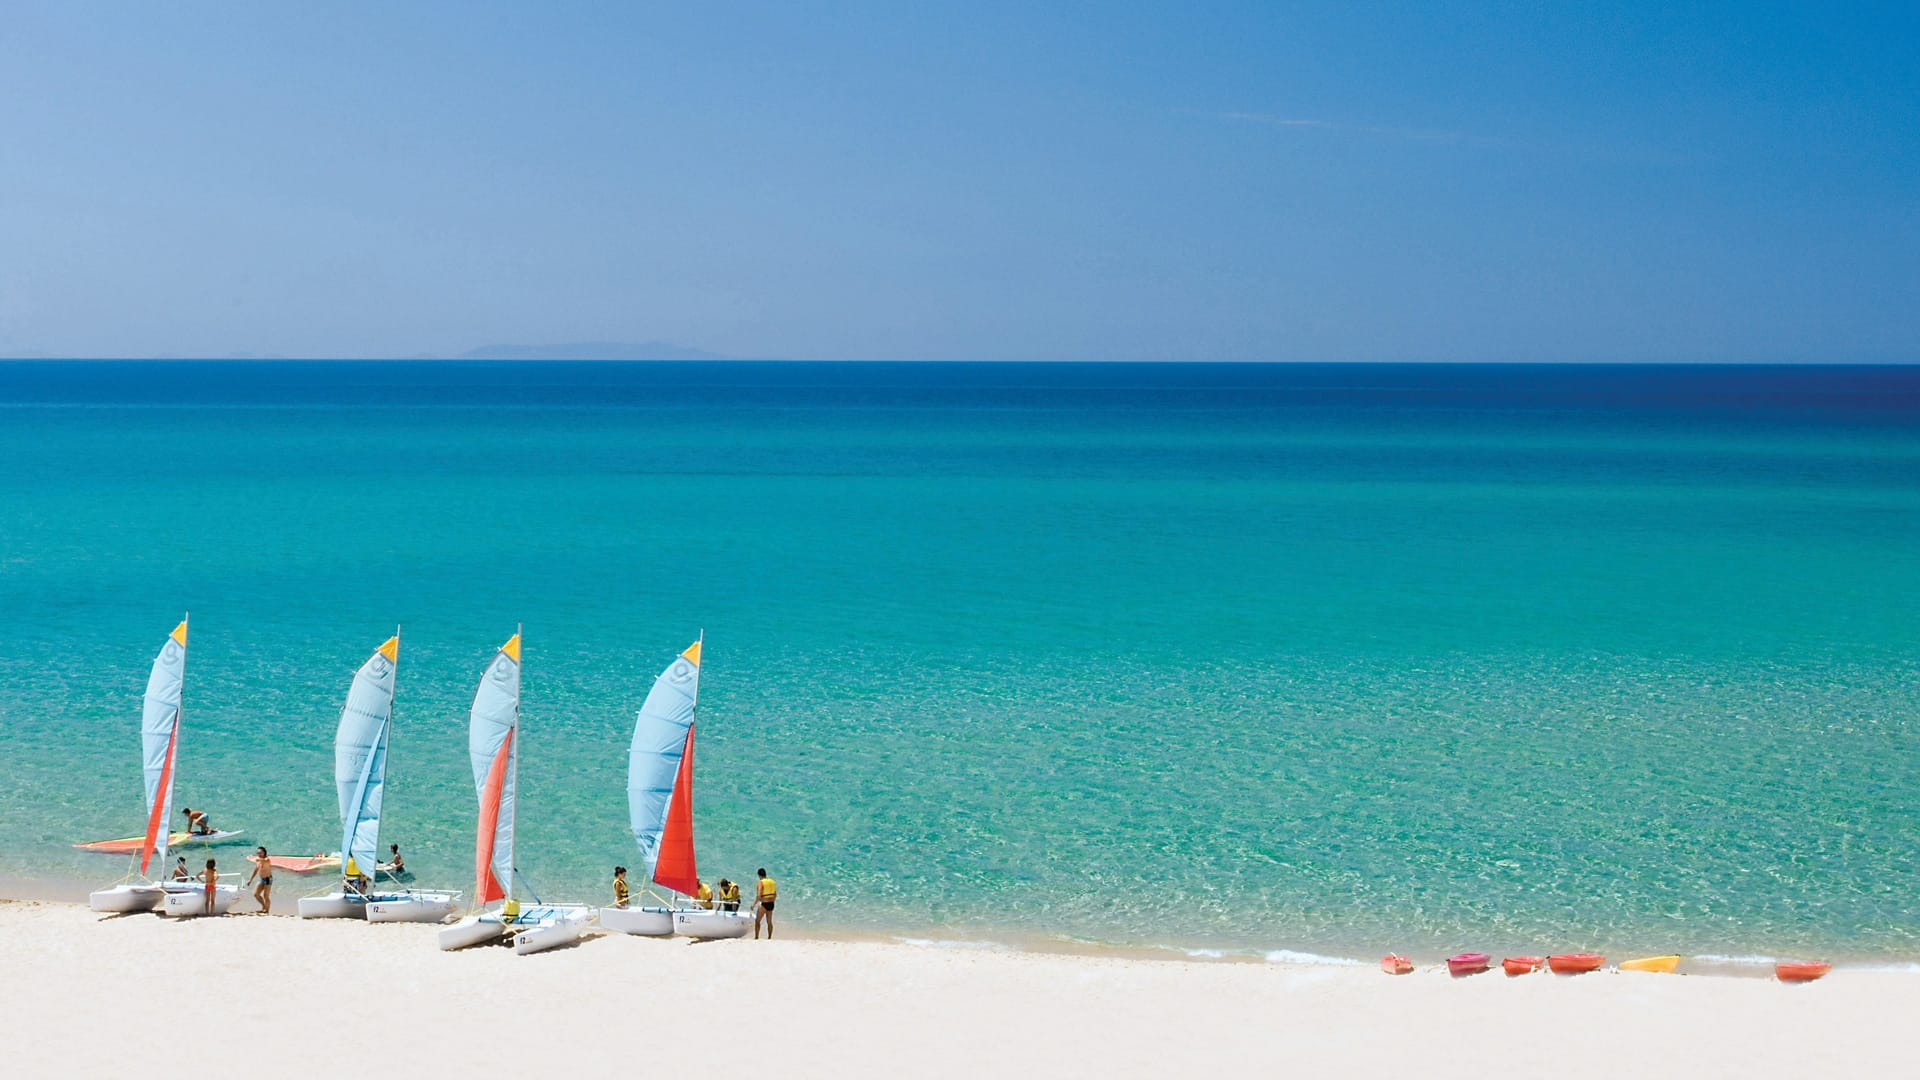 Sport a Vela - Le Dune Resort & SPA